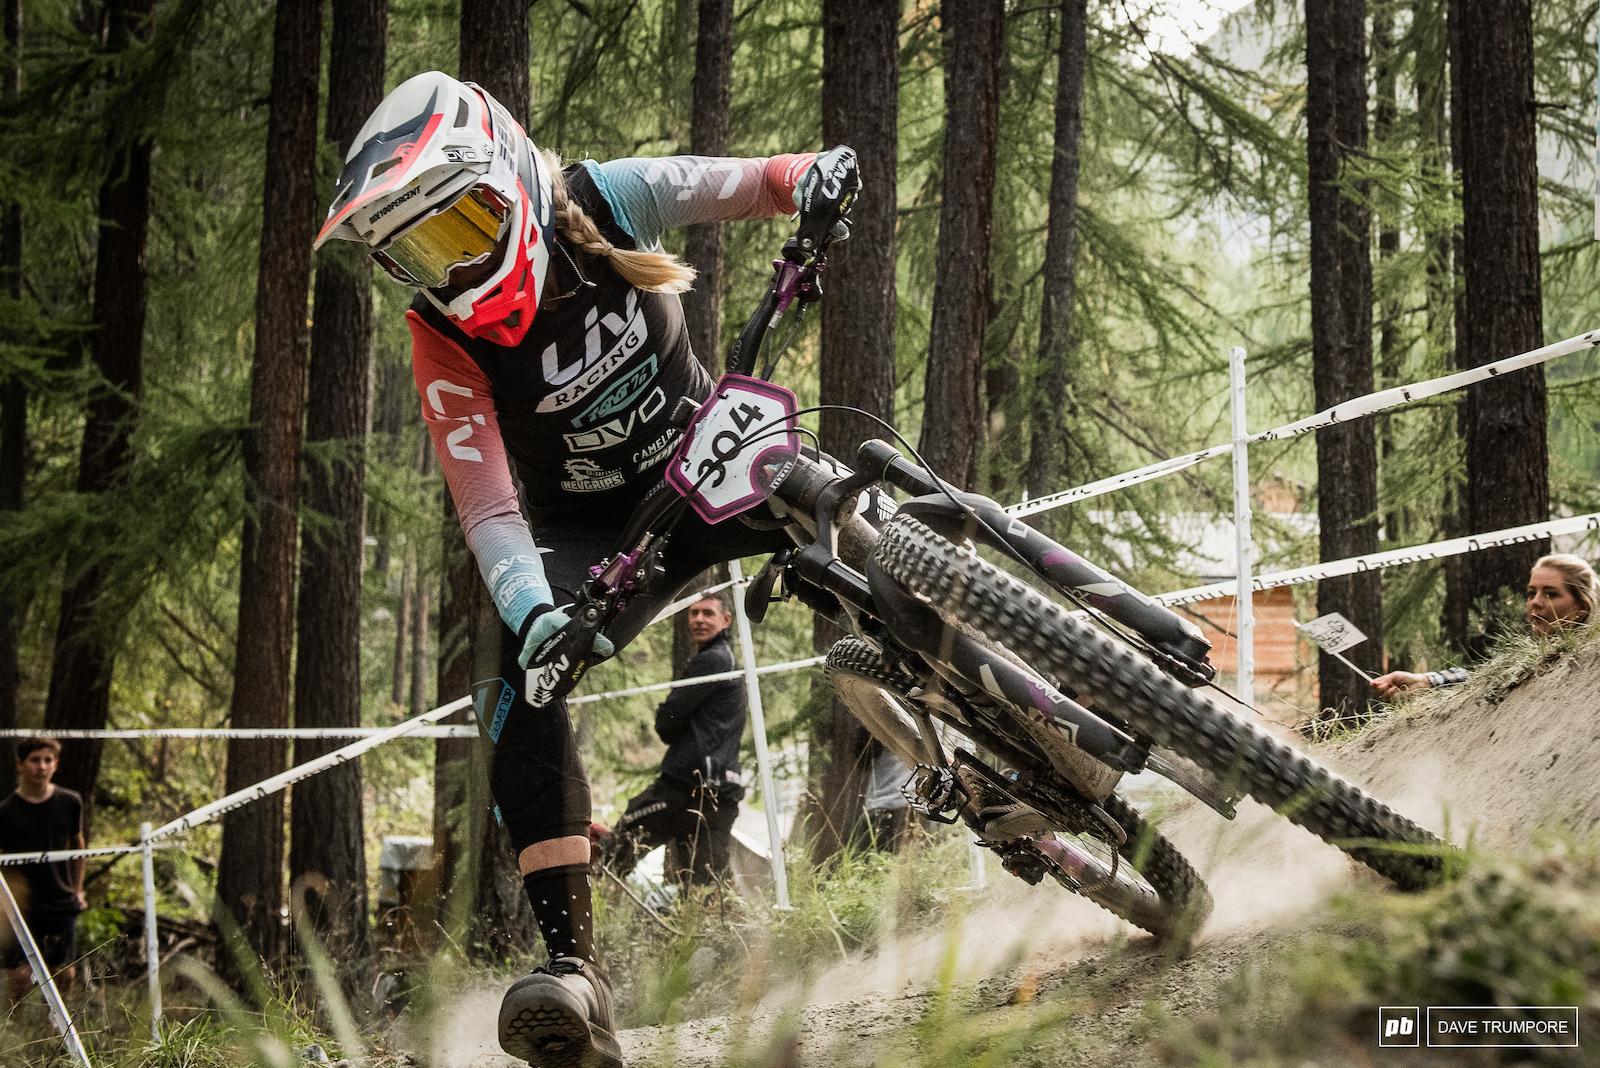 Rae Morrison drifting around the final corner of the 2019 season